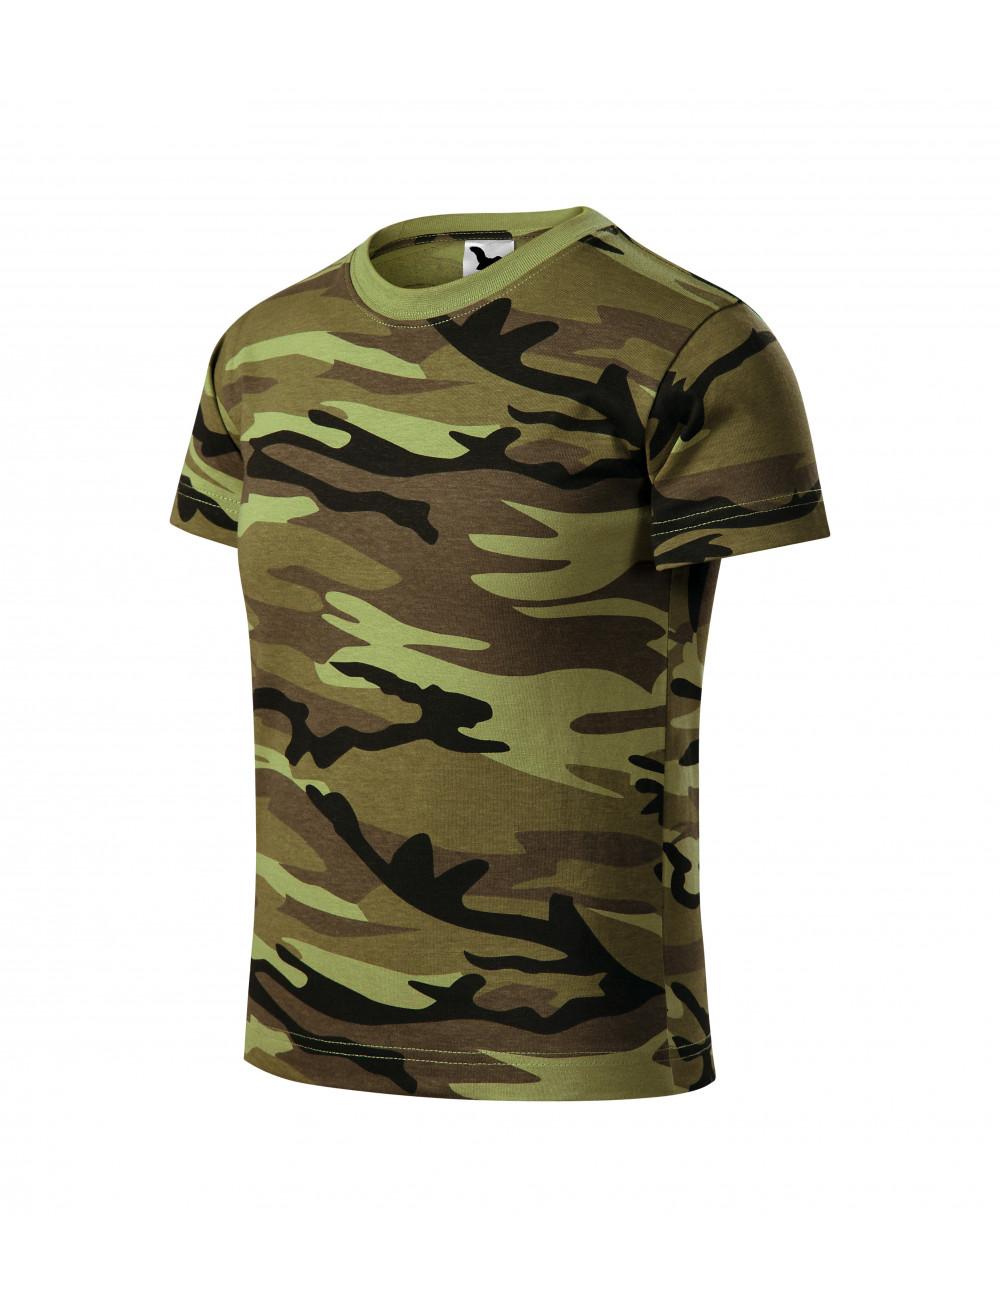 Adler MALFINI Koszulka dziecięca Camouflage 149 camouflage green